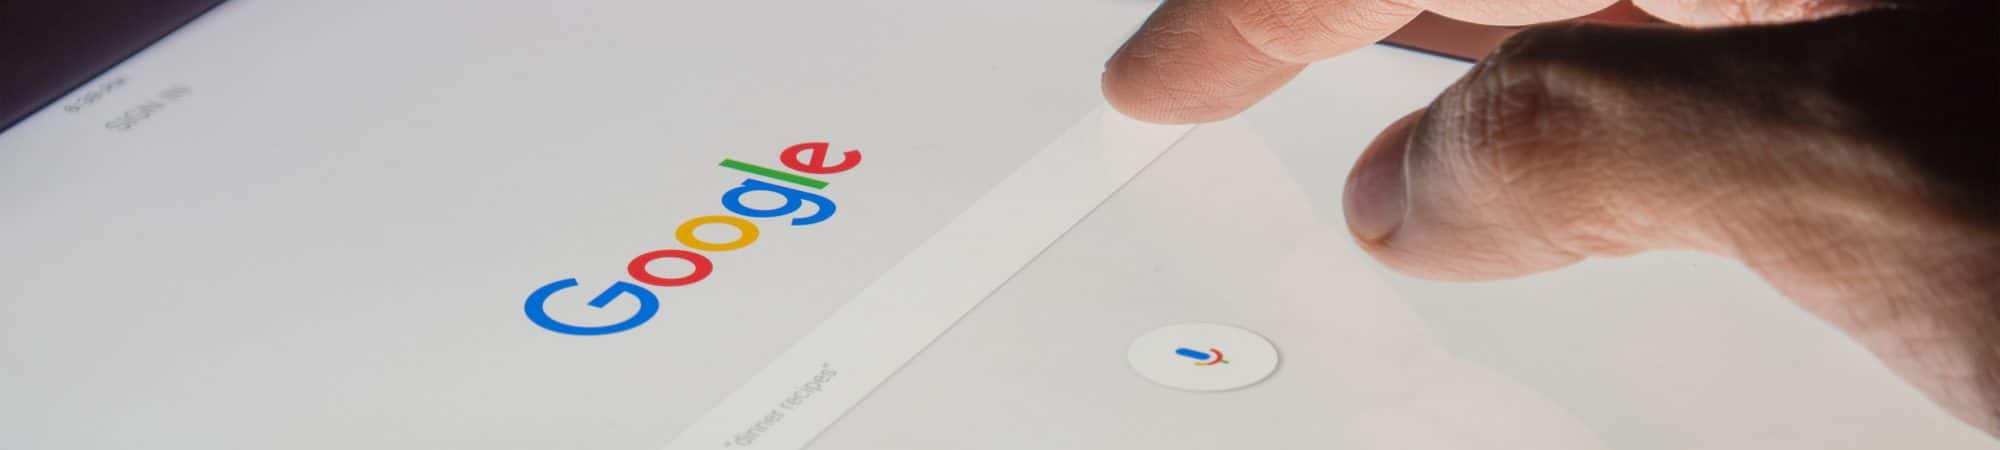 Google-1-2000x450